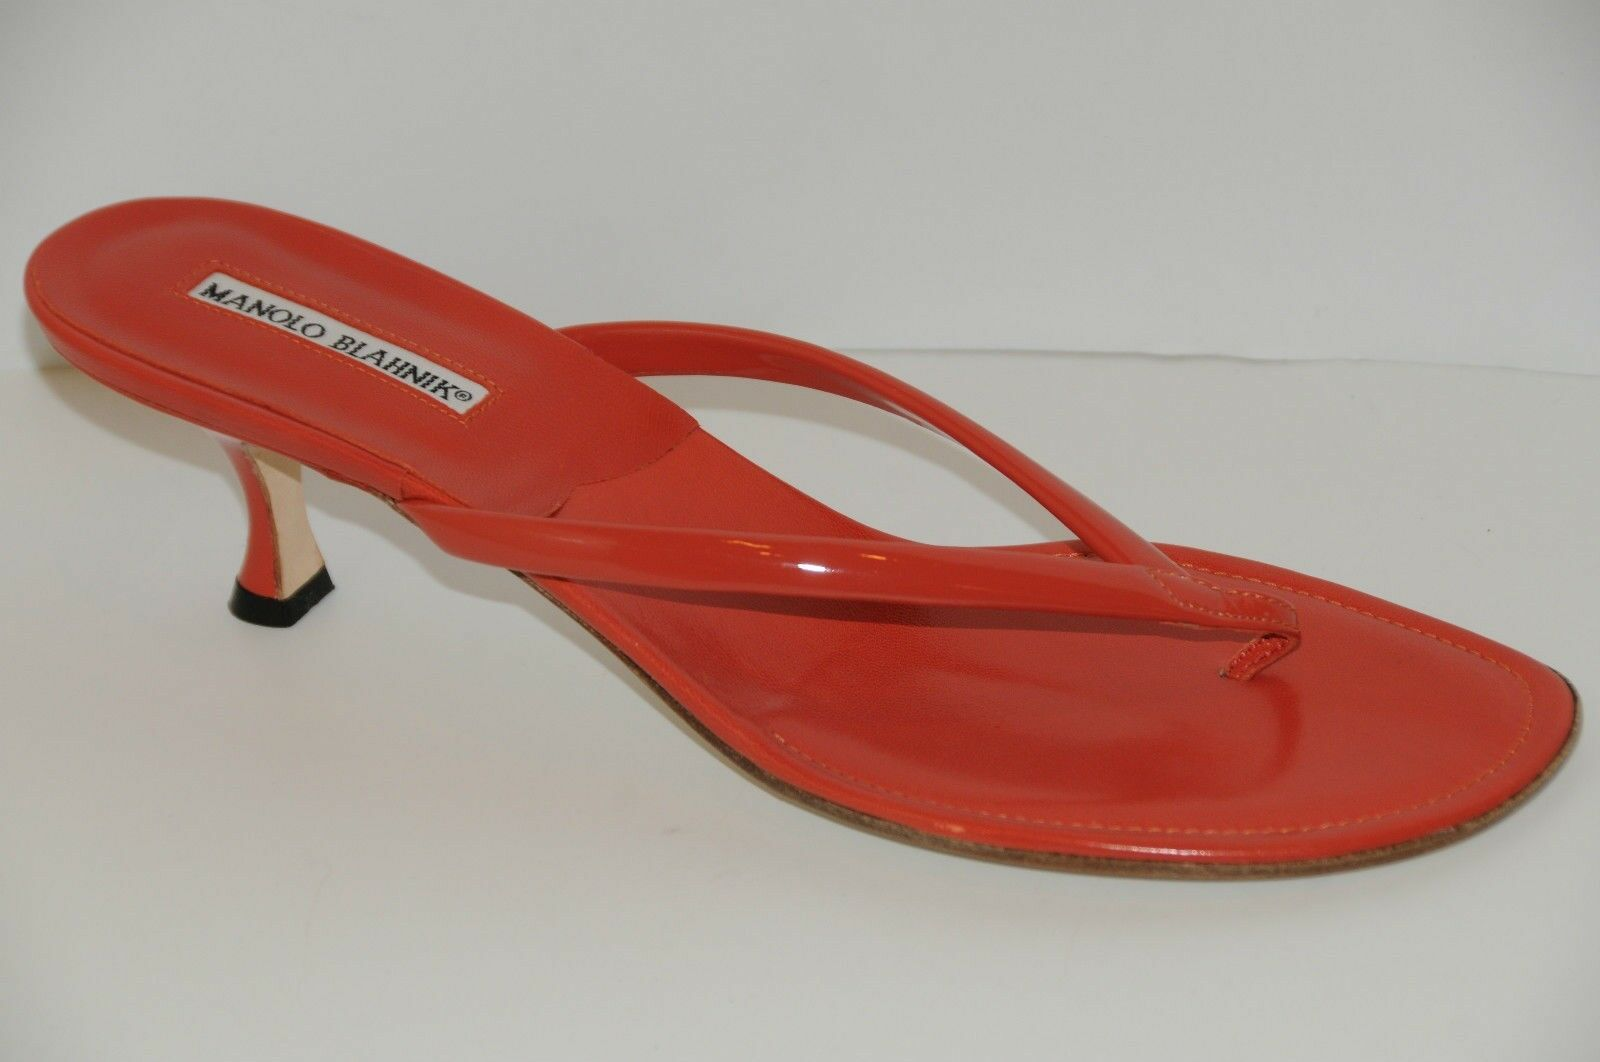 Neuf Femmeolo Blahnik Corail Orange  s s s Tongs Glissière Chaussures 57d0b8